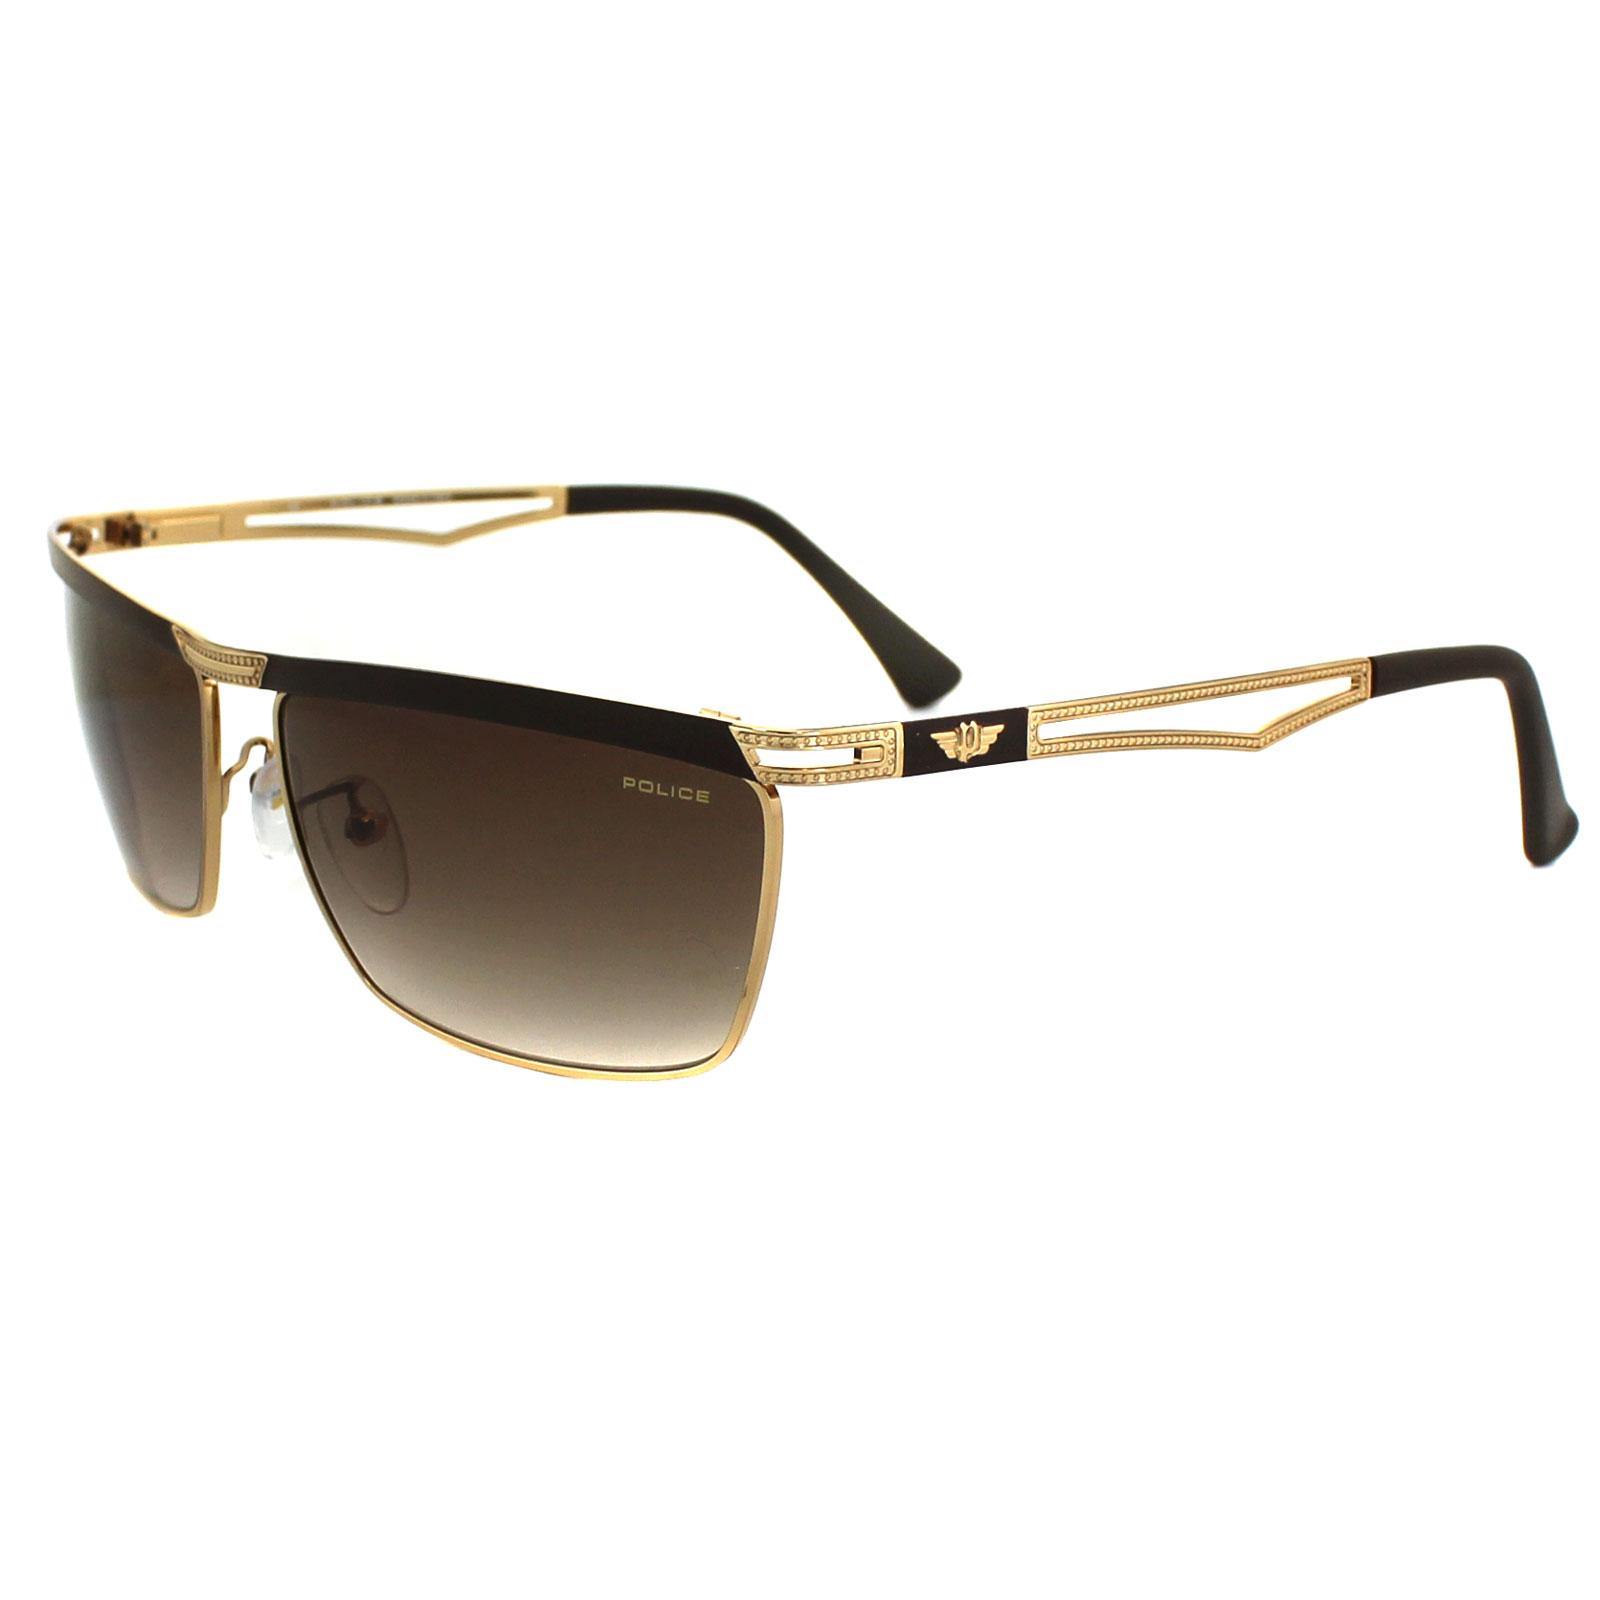 Gold Frame Police Sunglasses : Police Sunglasses Rush 2 8755 0F93 Gold Brown Gradient eBay